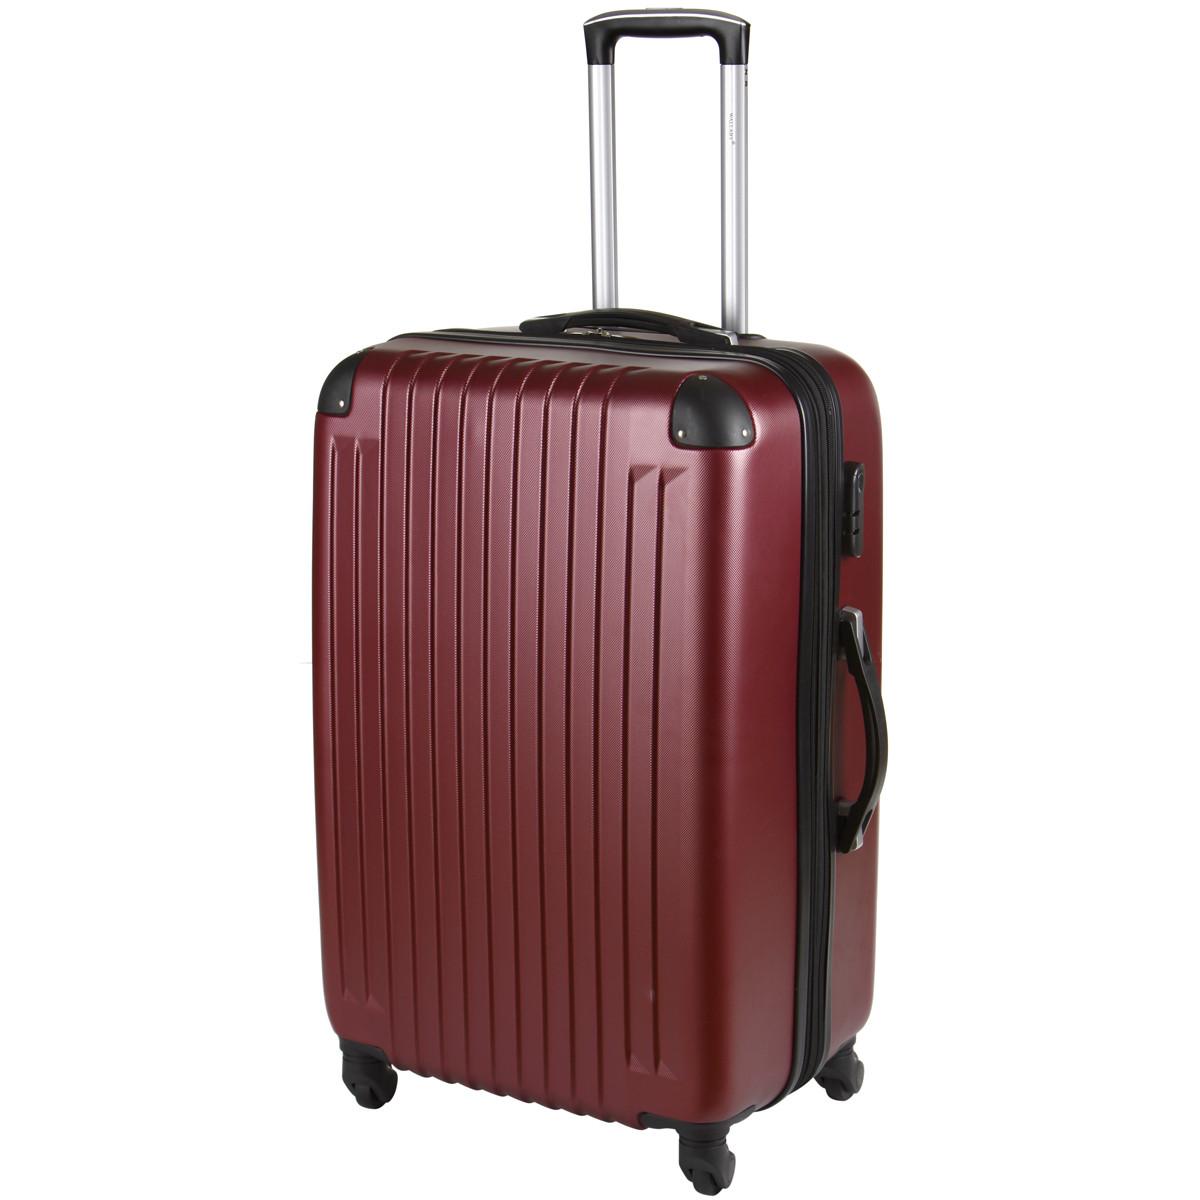 Чемодан Wallaby большой пластиковый  ABS  67(+6)х44х29(+3) цвет бордовый  в 6265-26бор